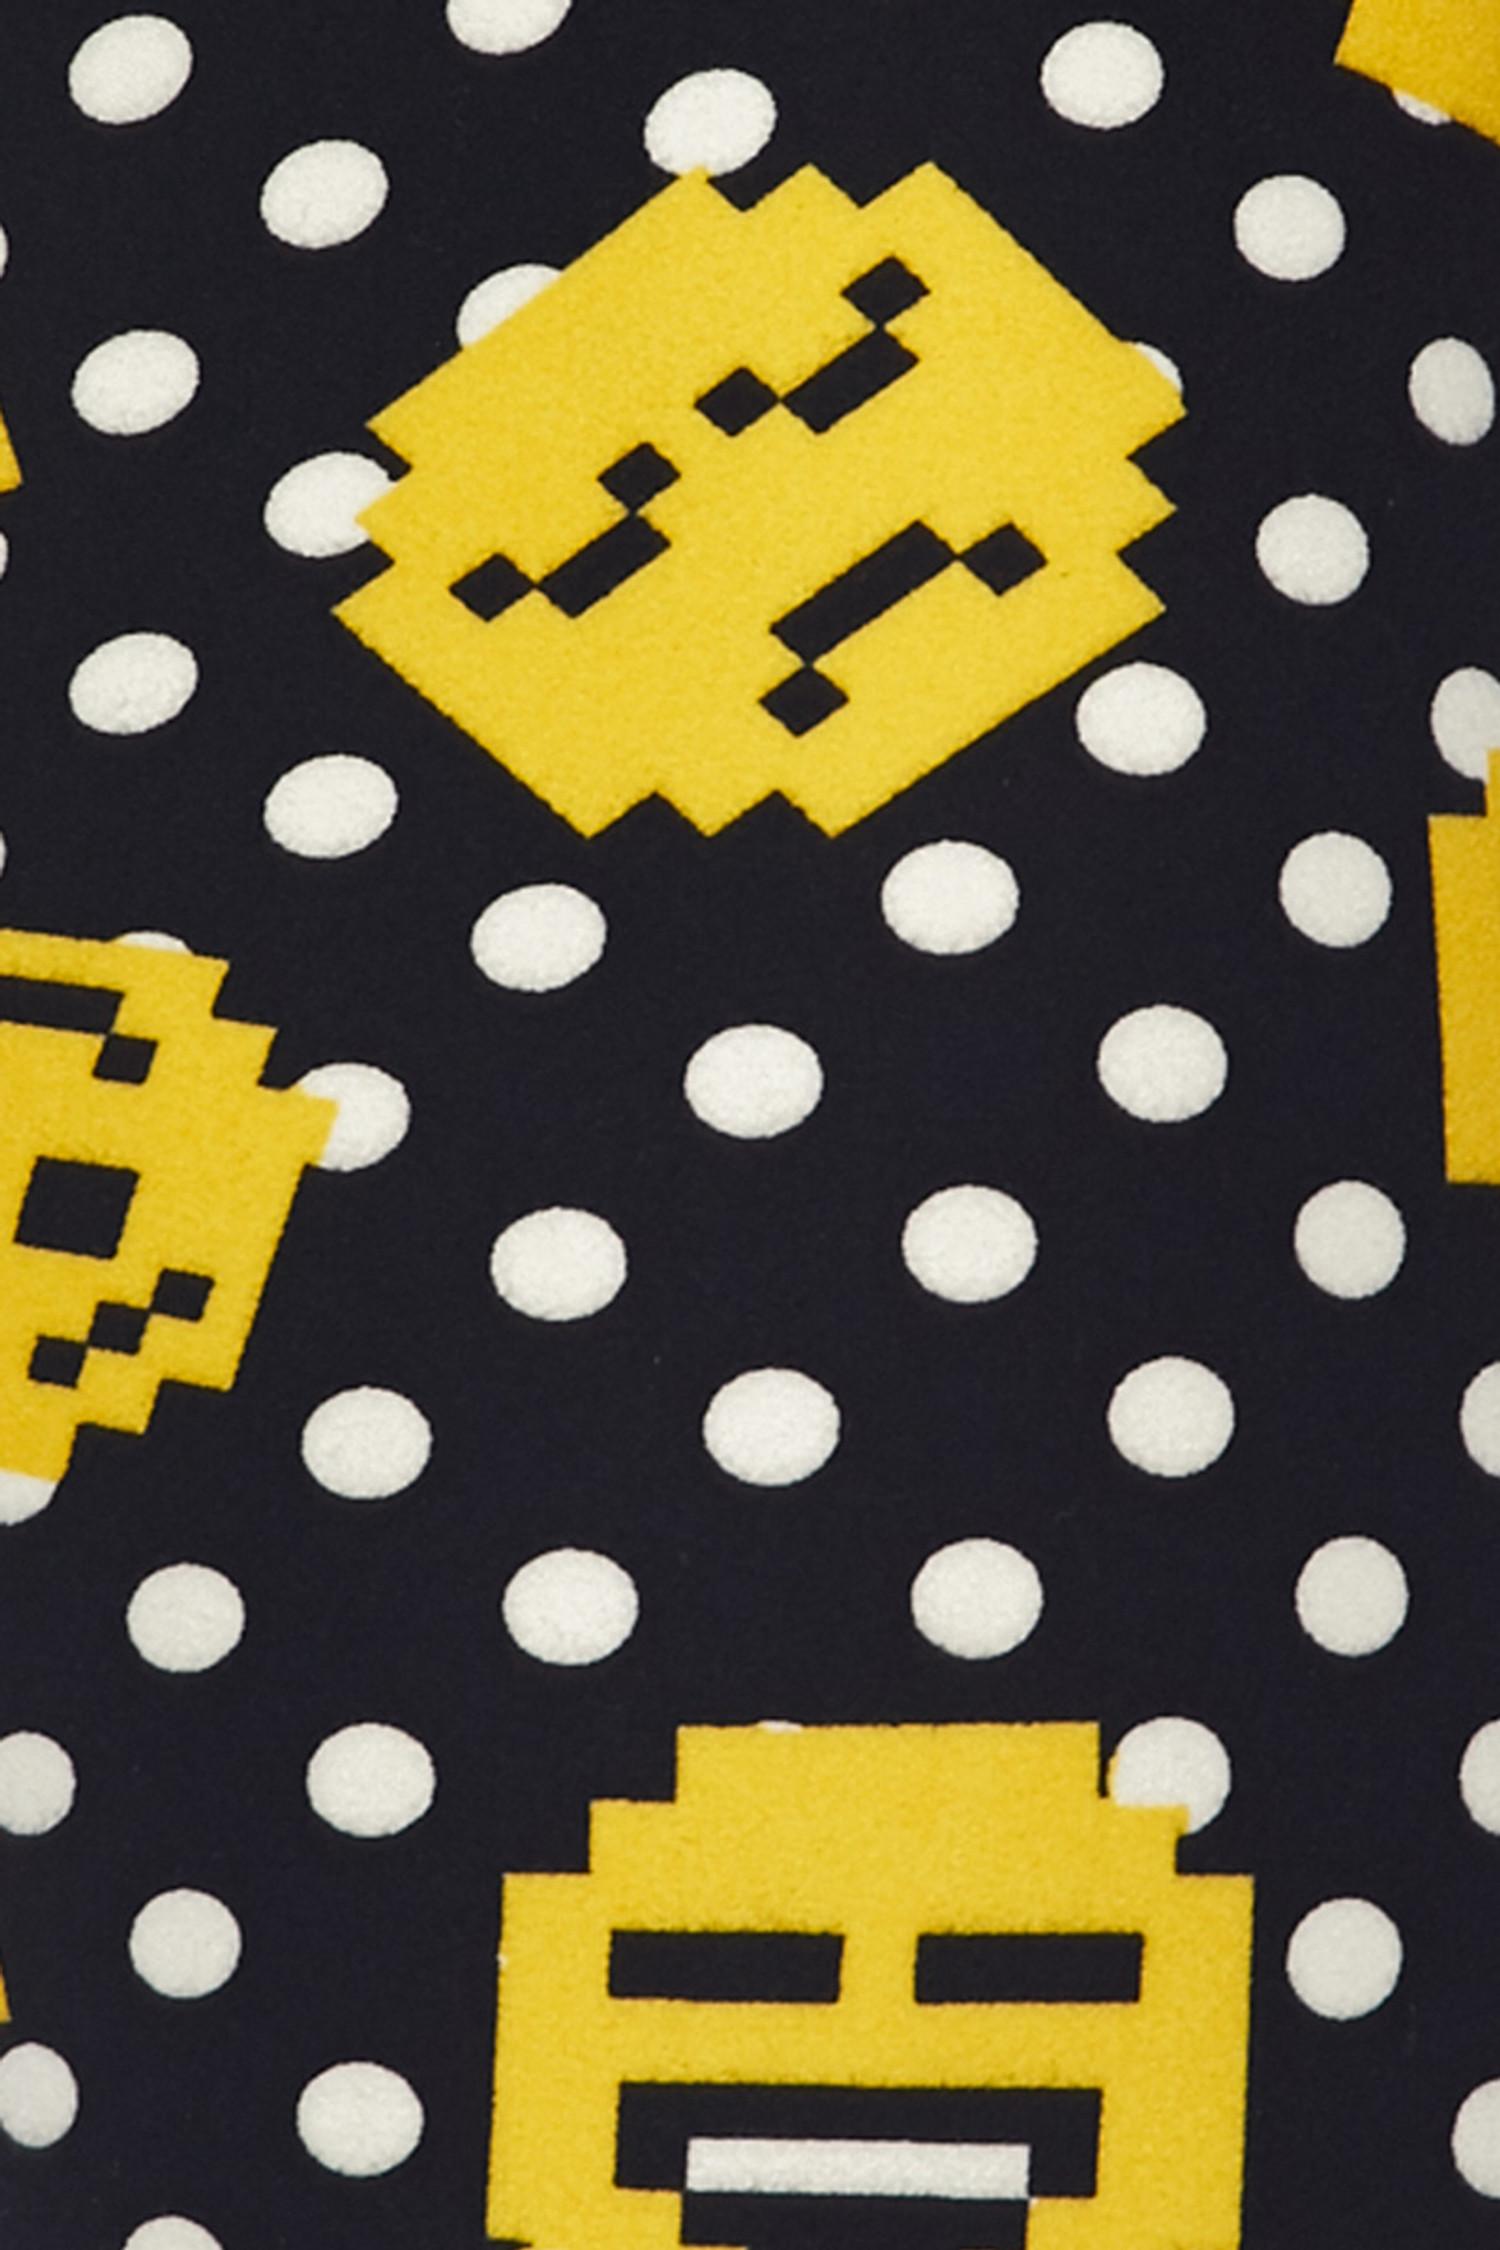 Brushed Retro Pixel Arcade Emoji Plus Size Leggings - 3X-5X